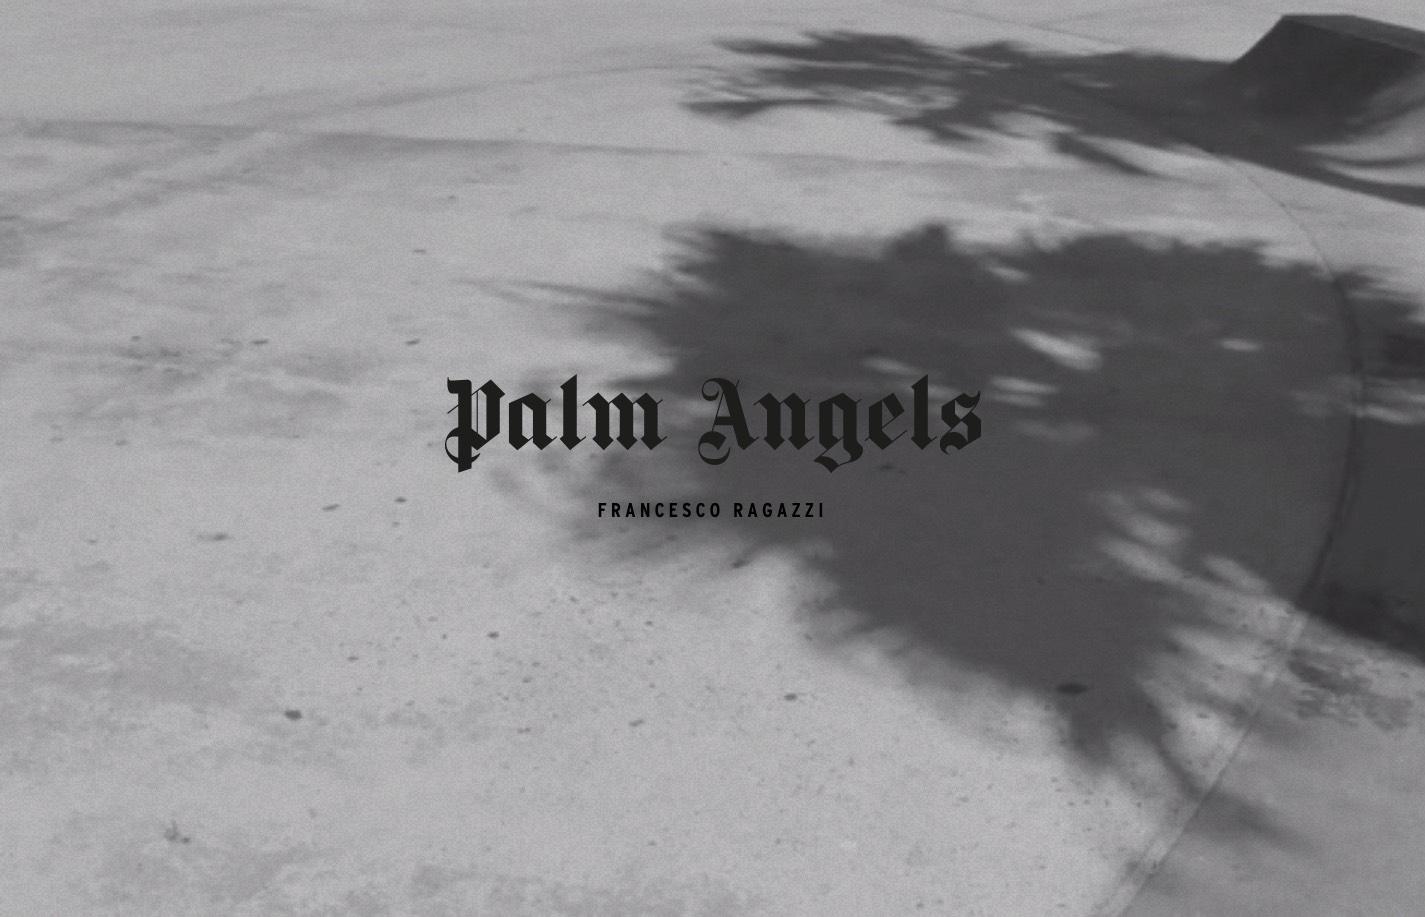 palm angels  Francesco Ragazzi book